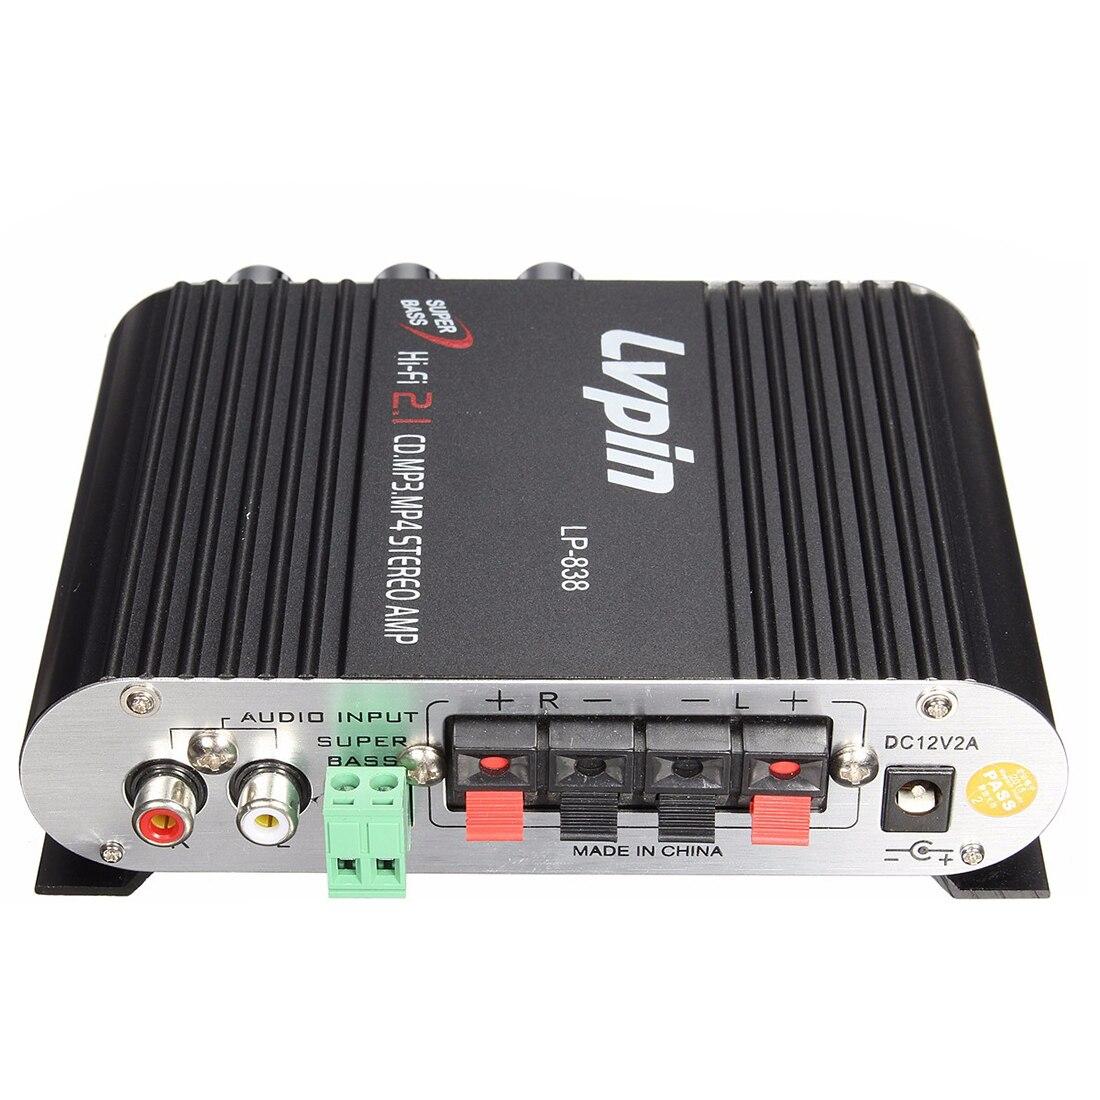 ATS FOR LVPIN 12V 200W Mini Hi-Fi Stereo Amplifier MP3 Car Radio Channels 2 House Super Bass